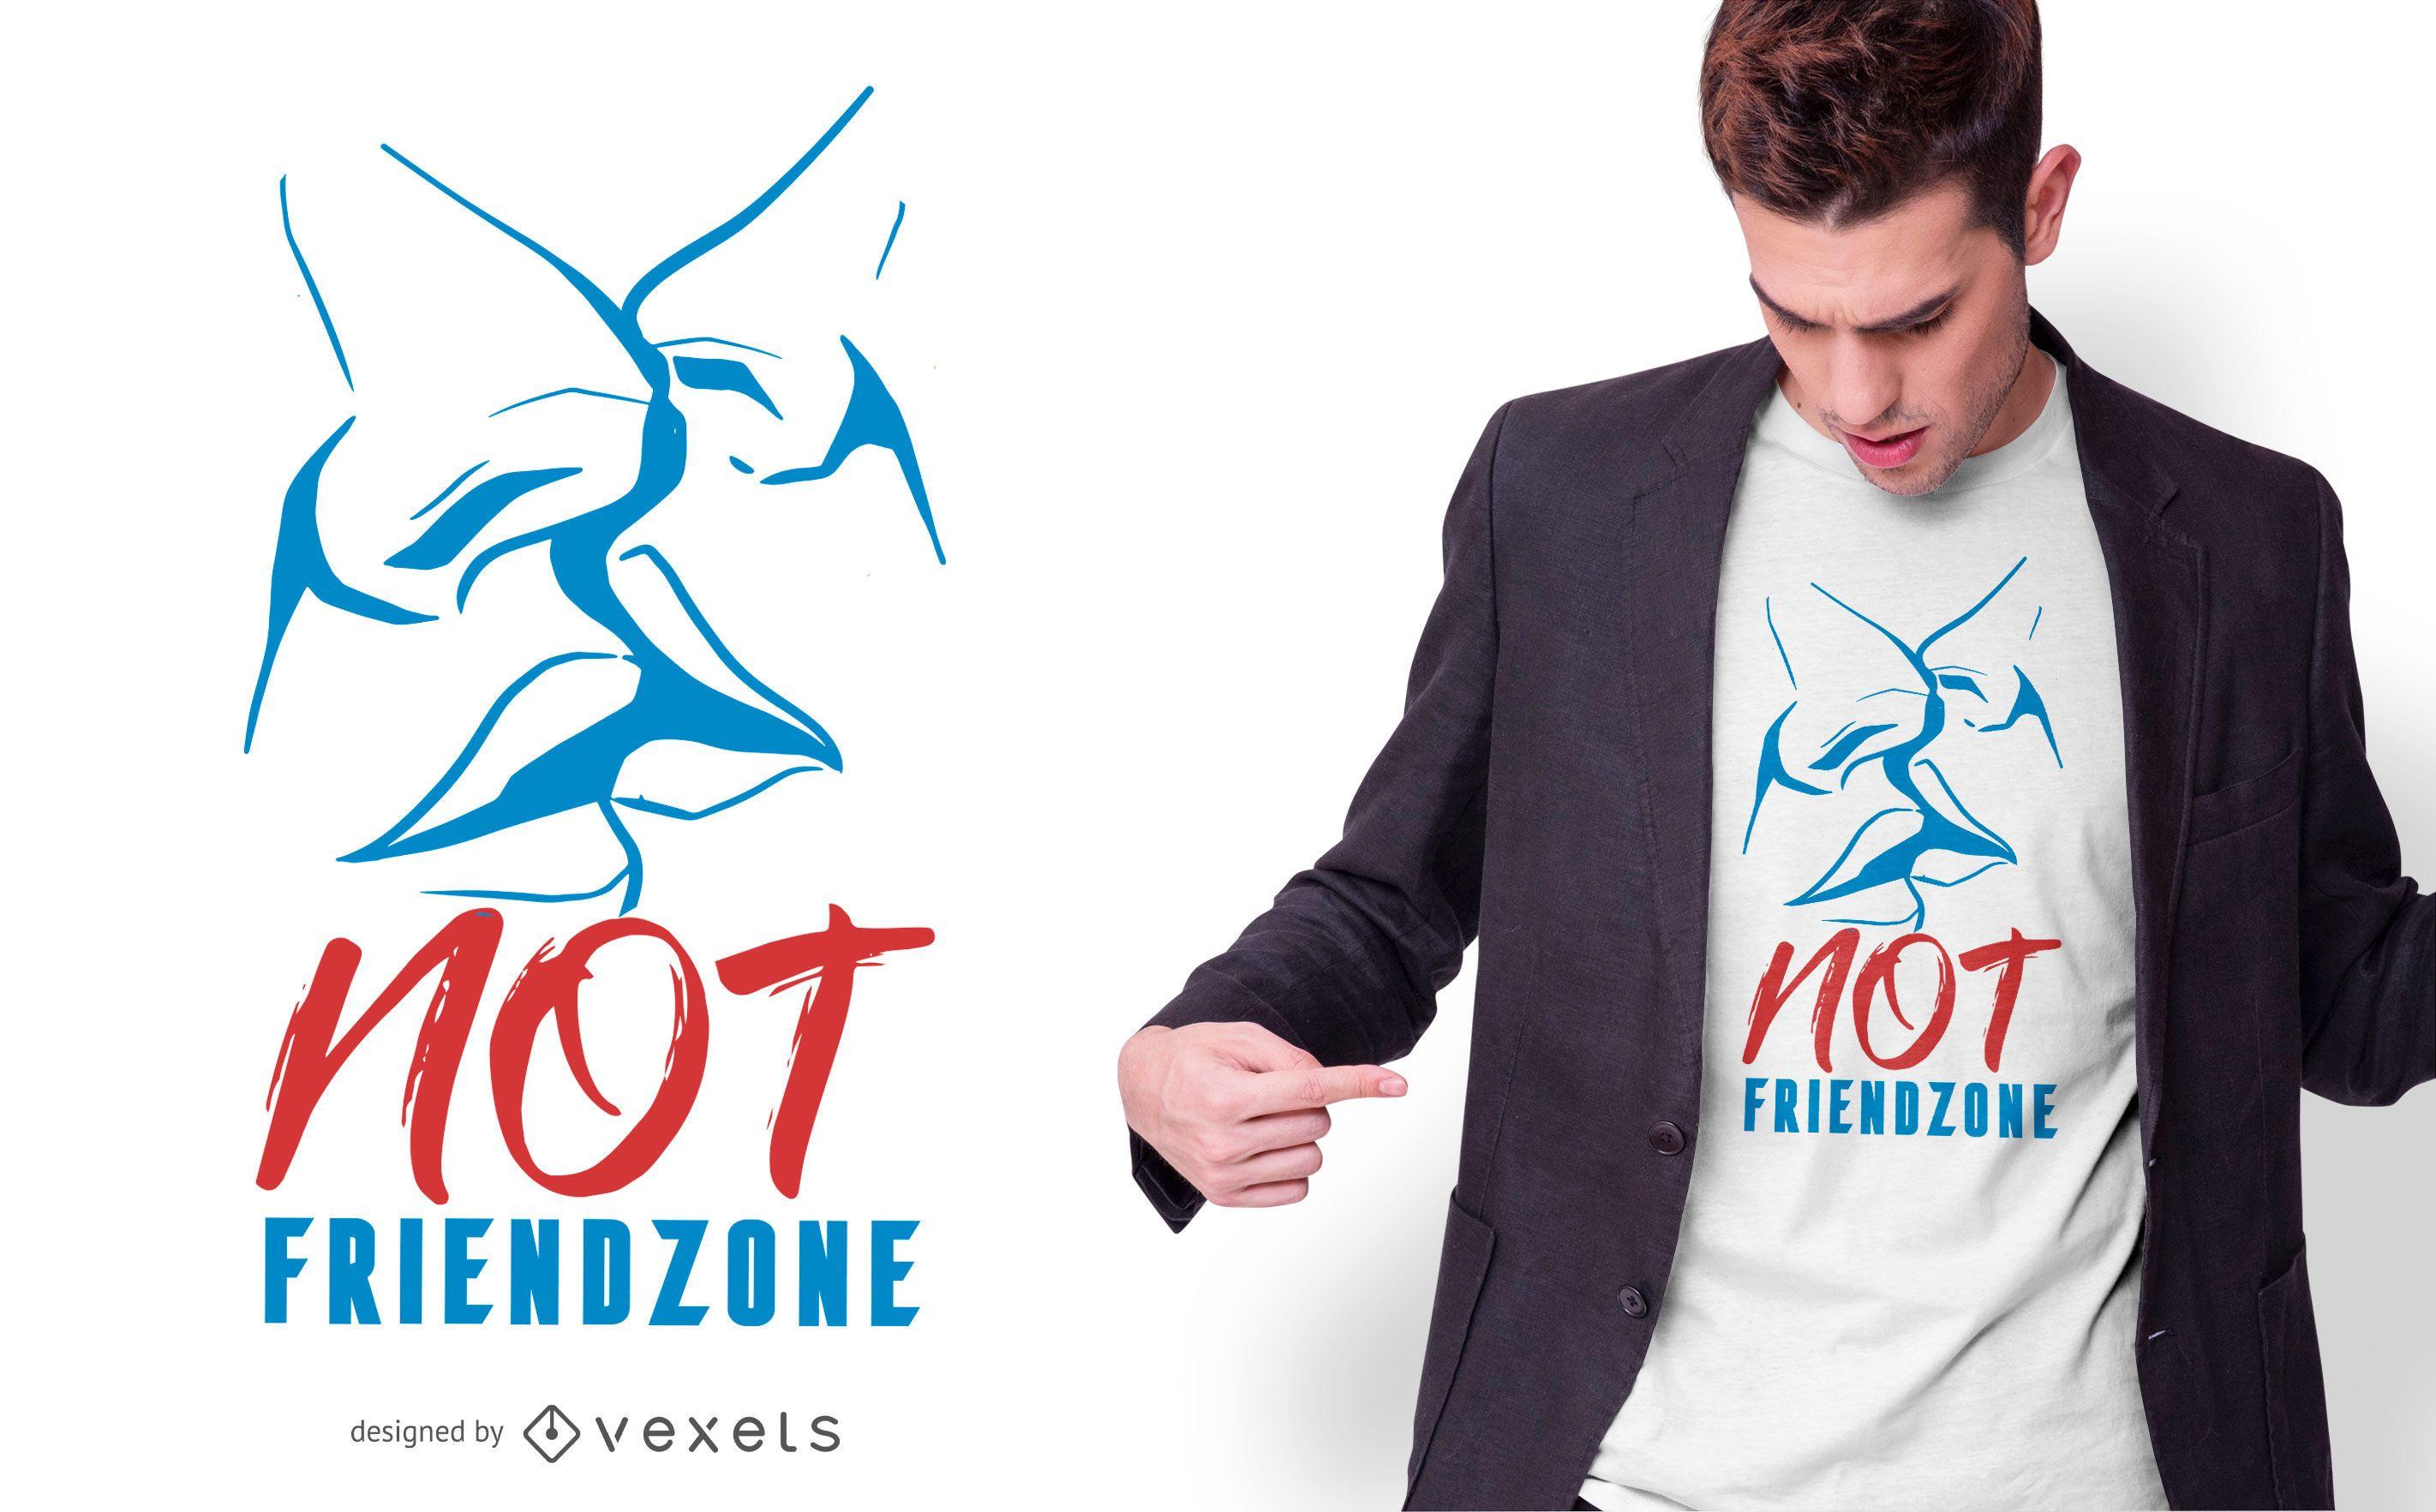 Not Friendzone T-shirt Design